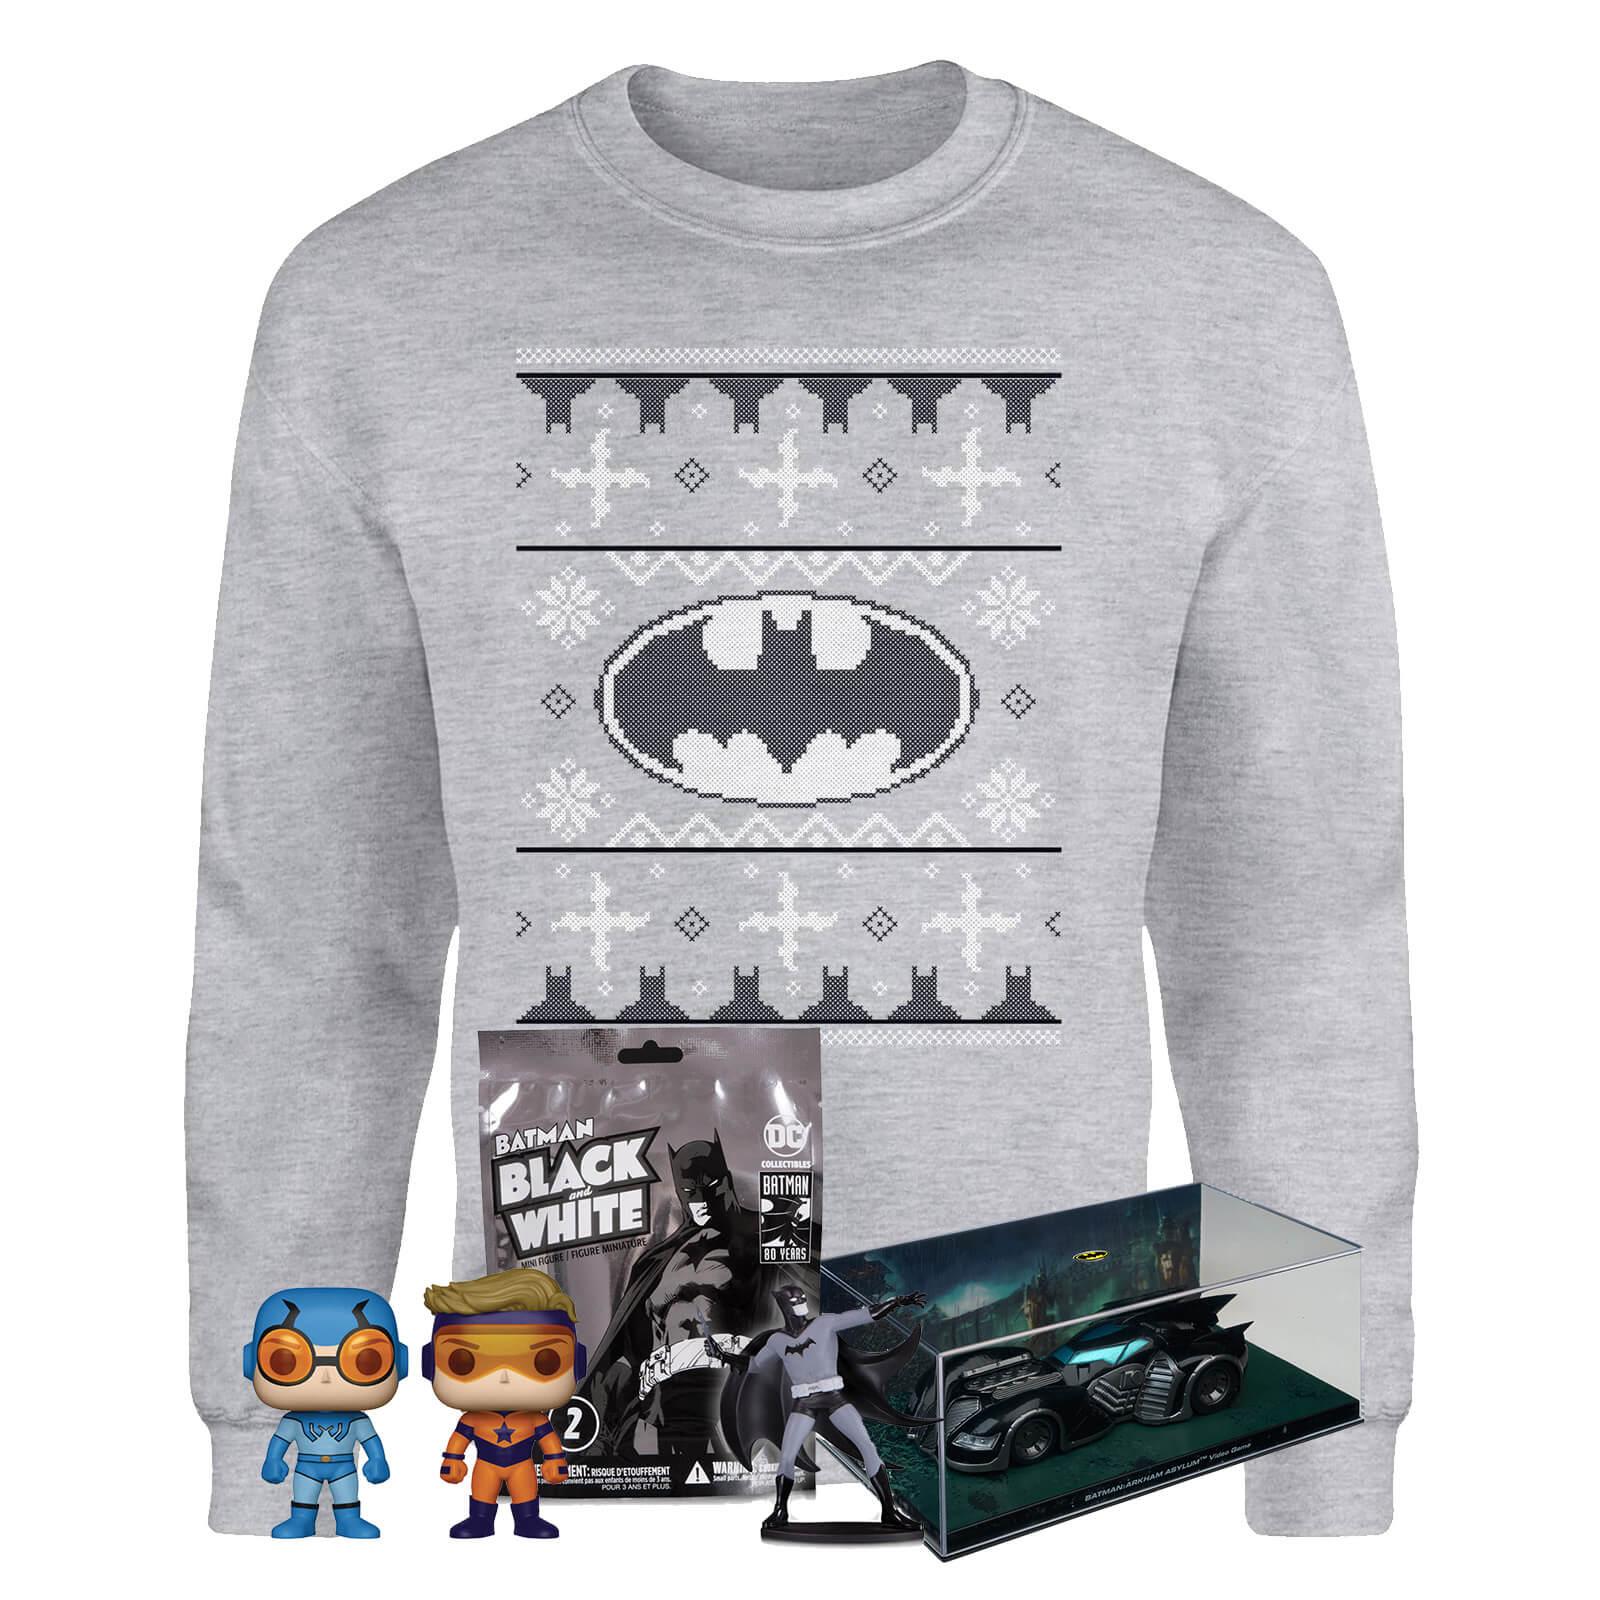 DC Offiziell Lizenziertes Weihnachtsbundle: Batman Weihnachts-Sweatshirt (Gr. S-XXL) + Batmobile +Batman Mini Figur + Funko Pop